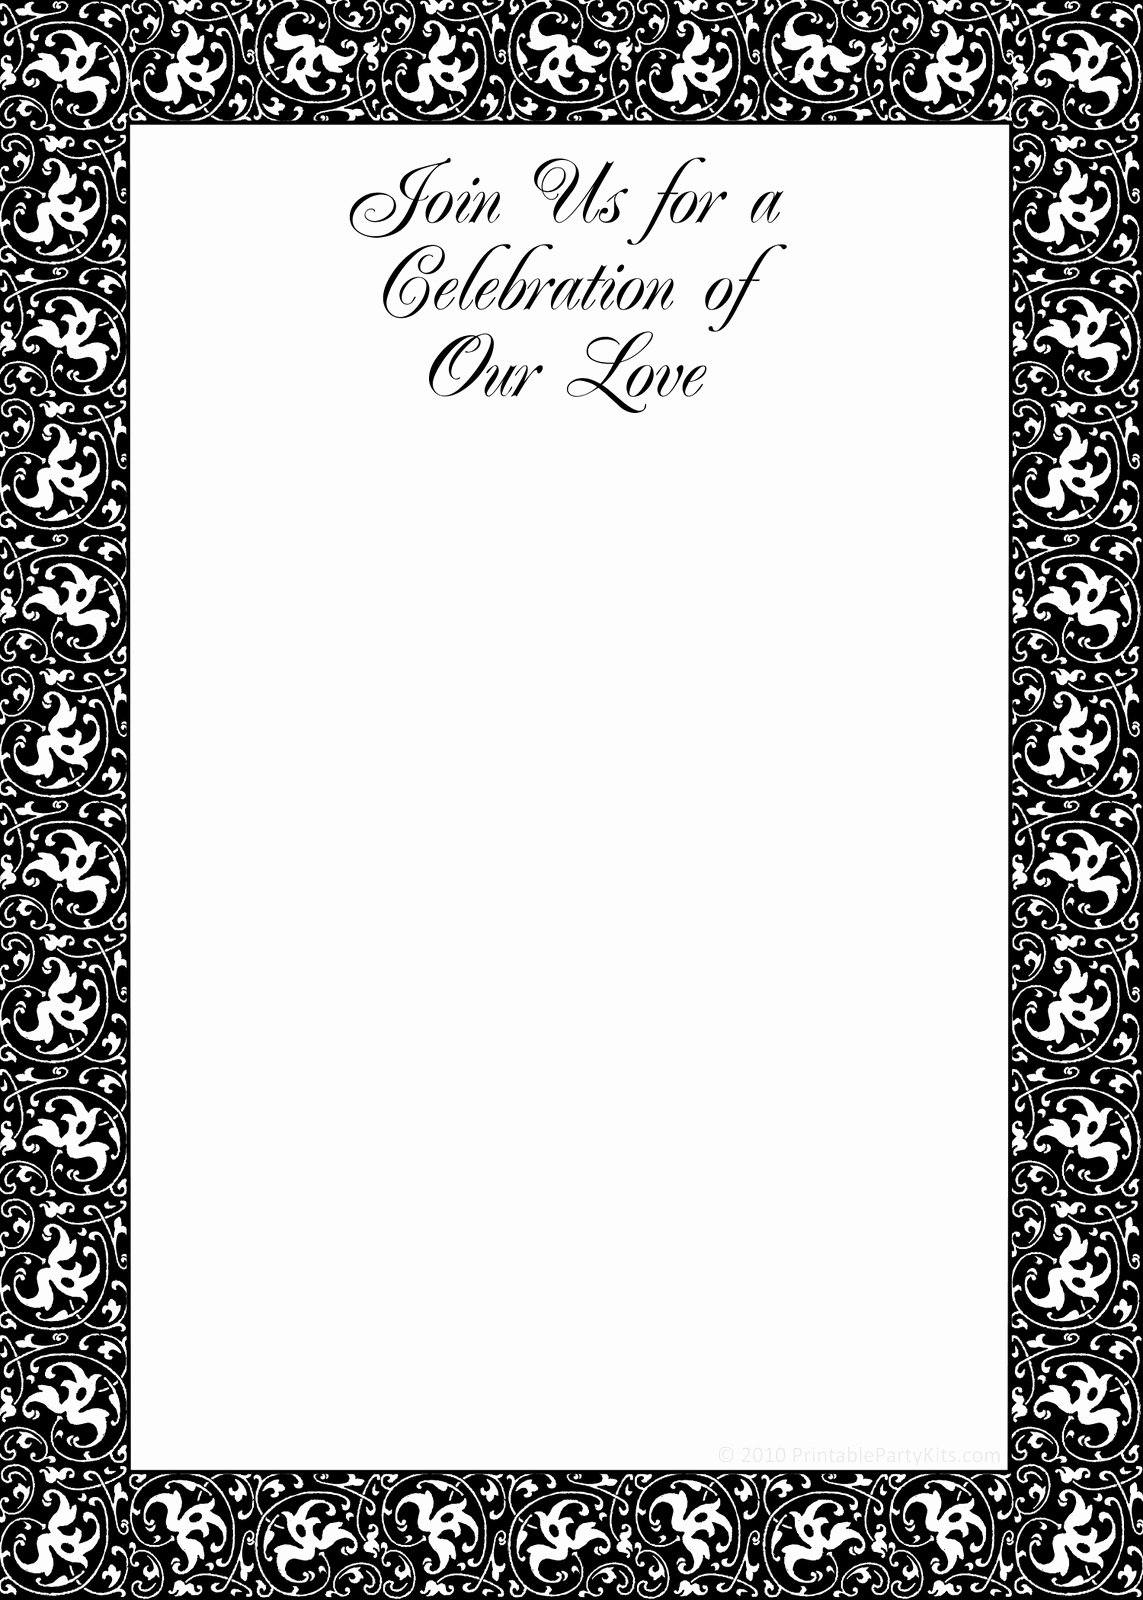 Free Printable Party Invitations Black and White Mitment Ceremony Invitation